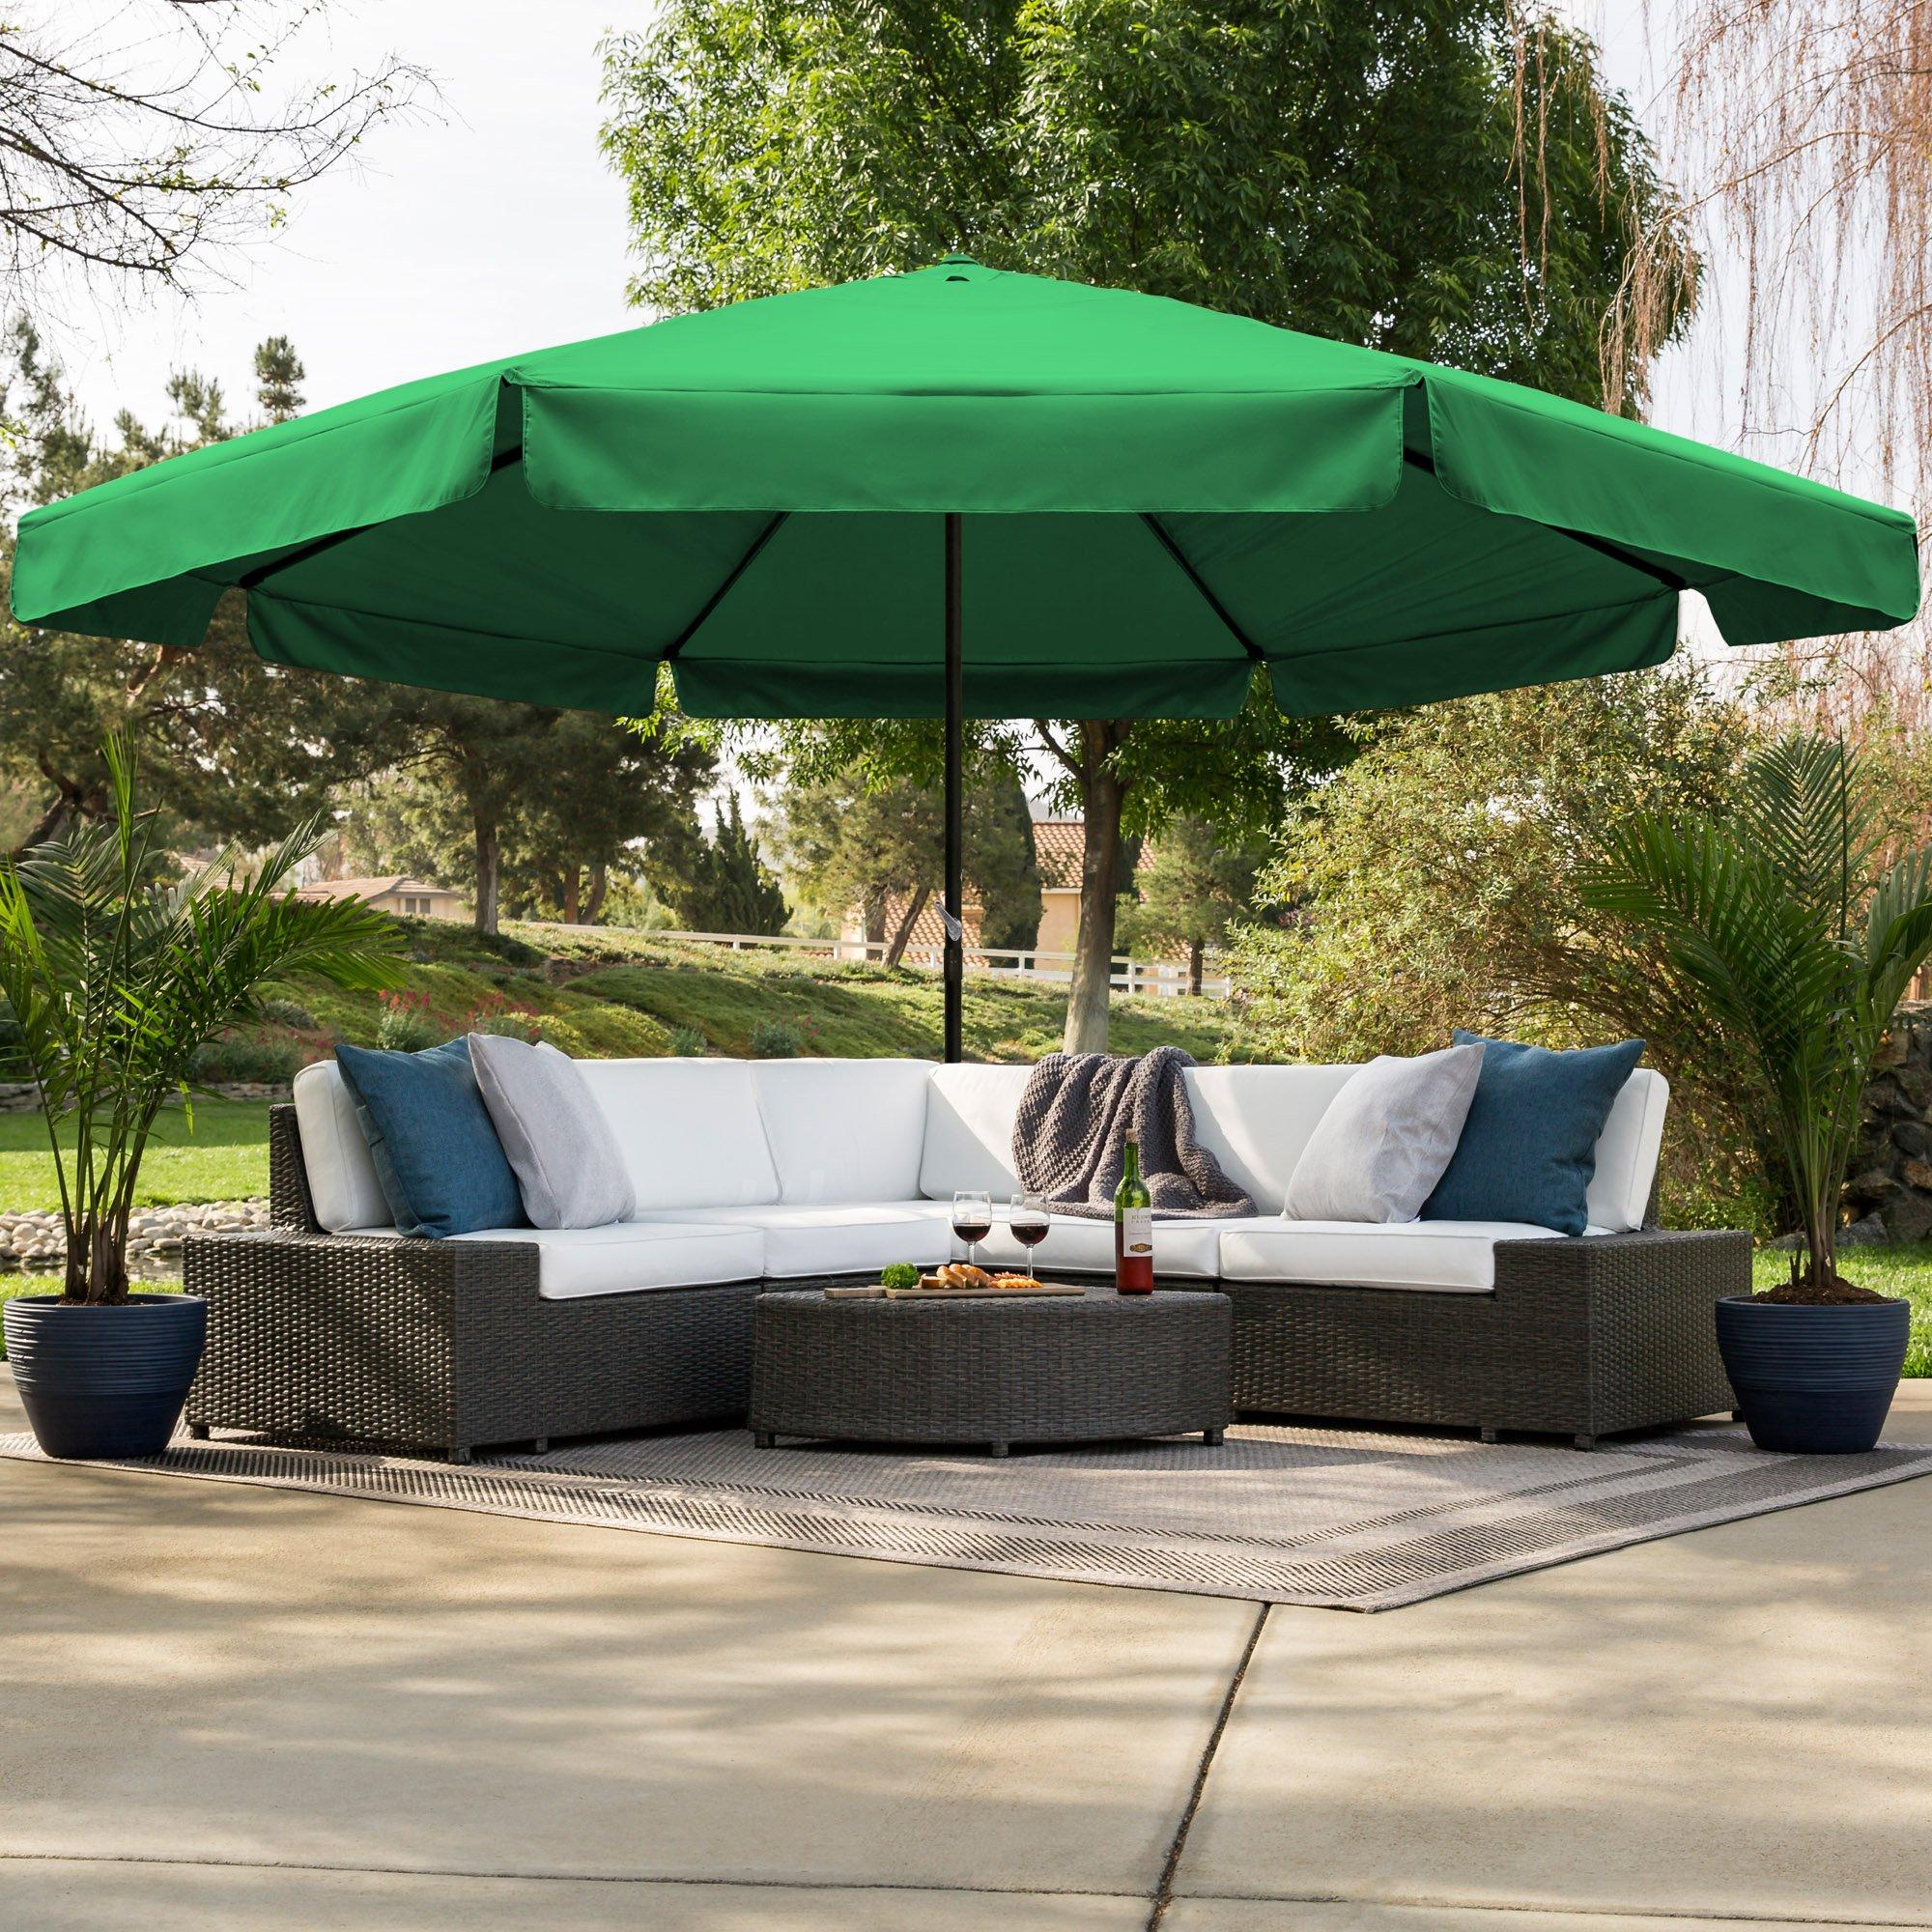 Best Choice Products 16ft Outdoor Patio Drape Canopy Market Umbrella w/Cross Base, Crank, Air Vent - Green